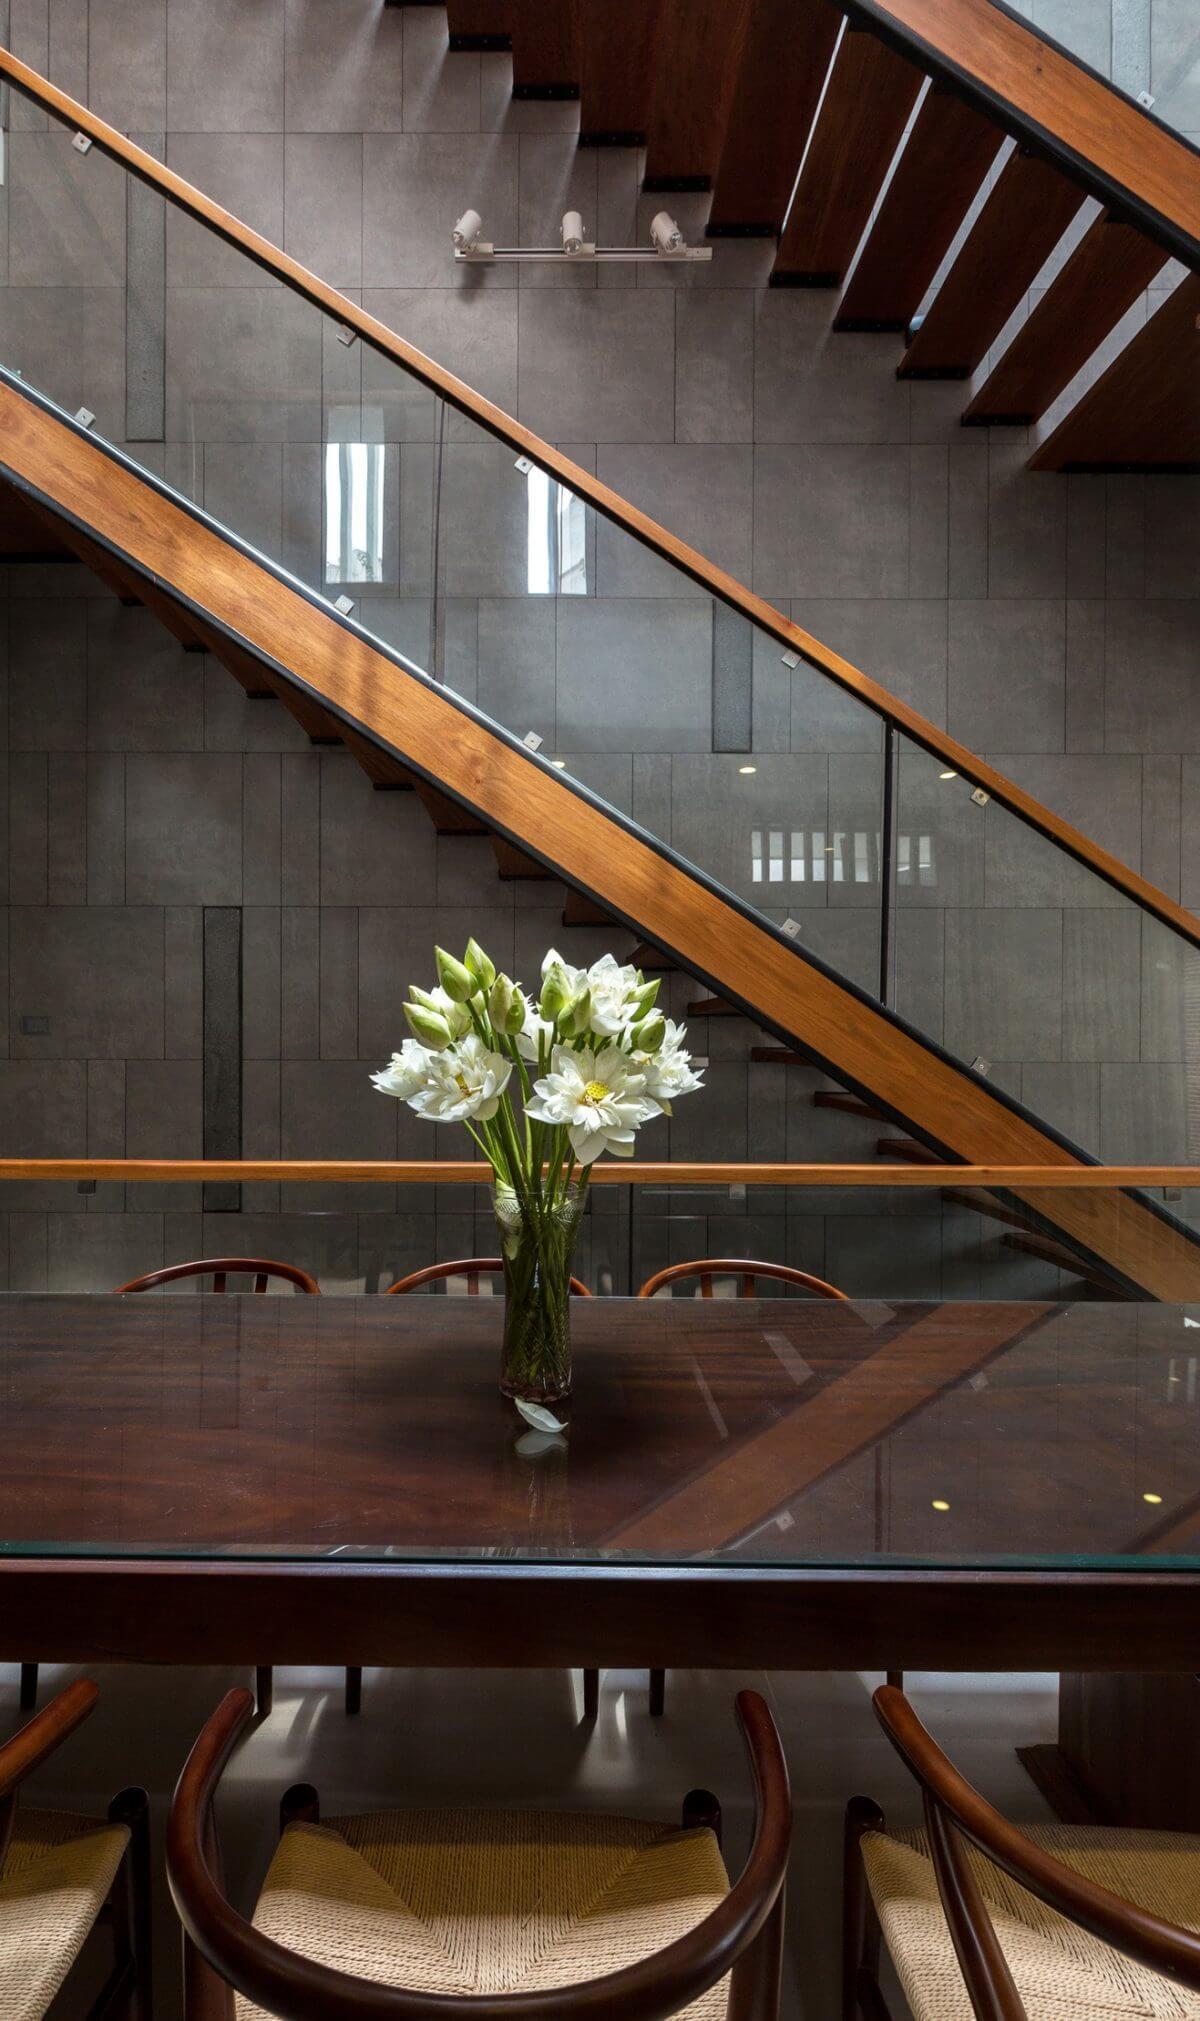 VMhouse_interiors_5k_resize